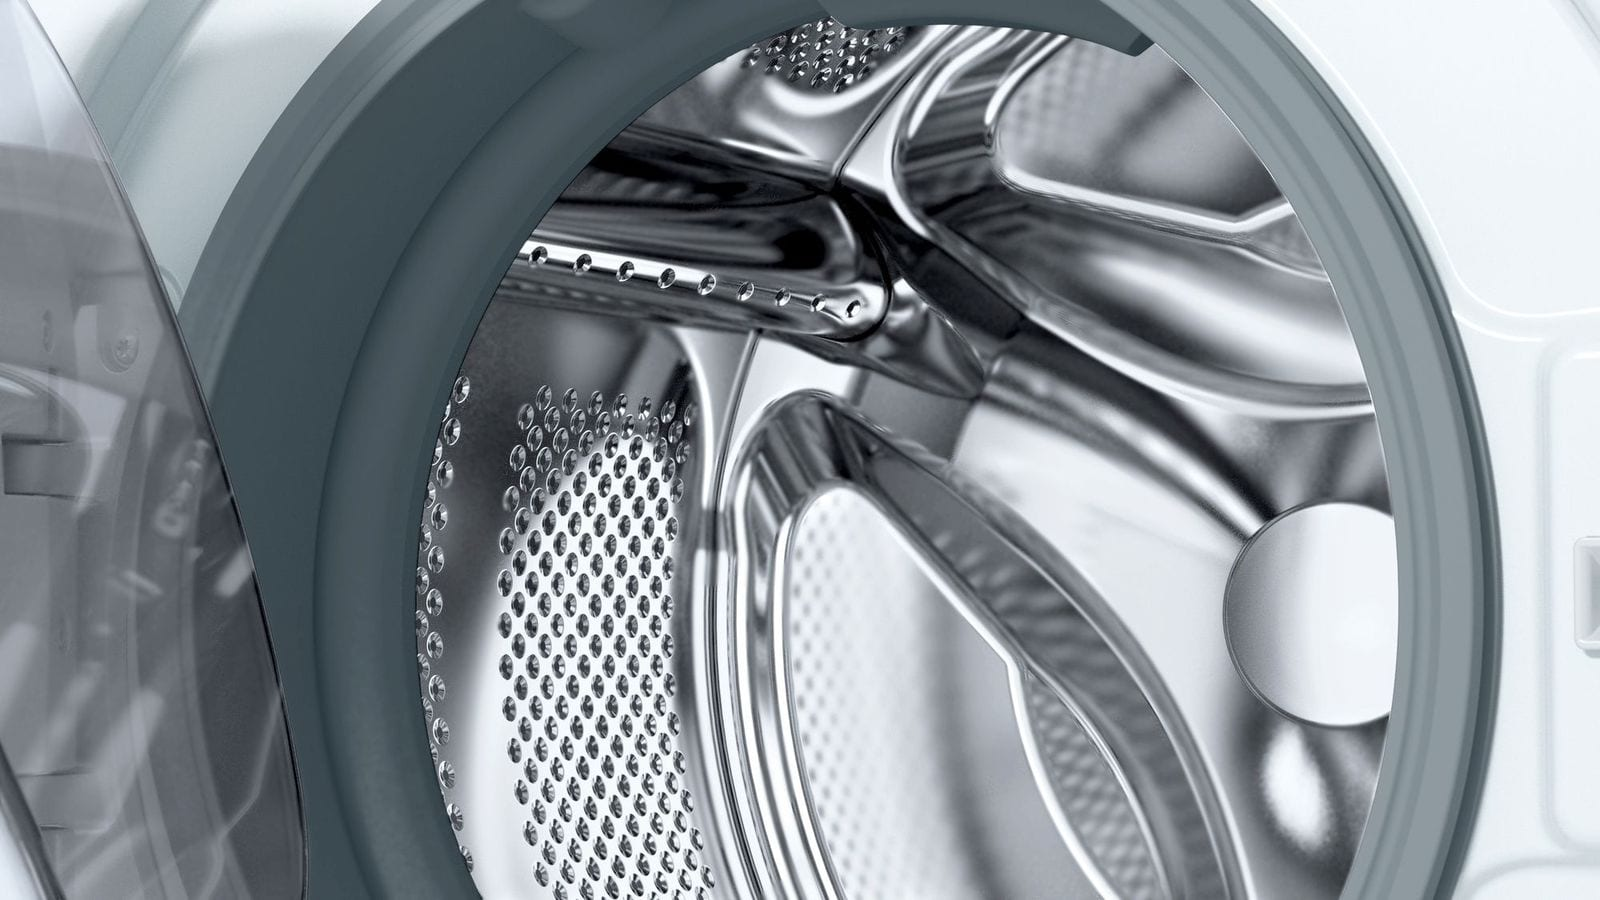 CDA CI921 Integrated Built In 7Kg 8 Program Sensor Tumble Dryer In White